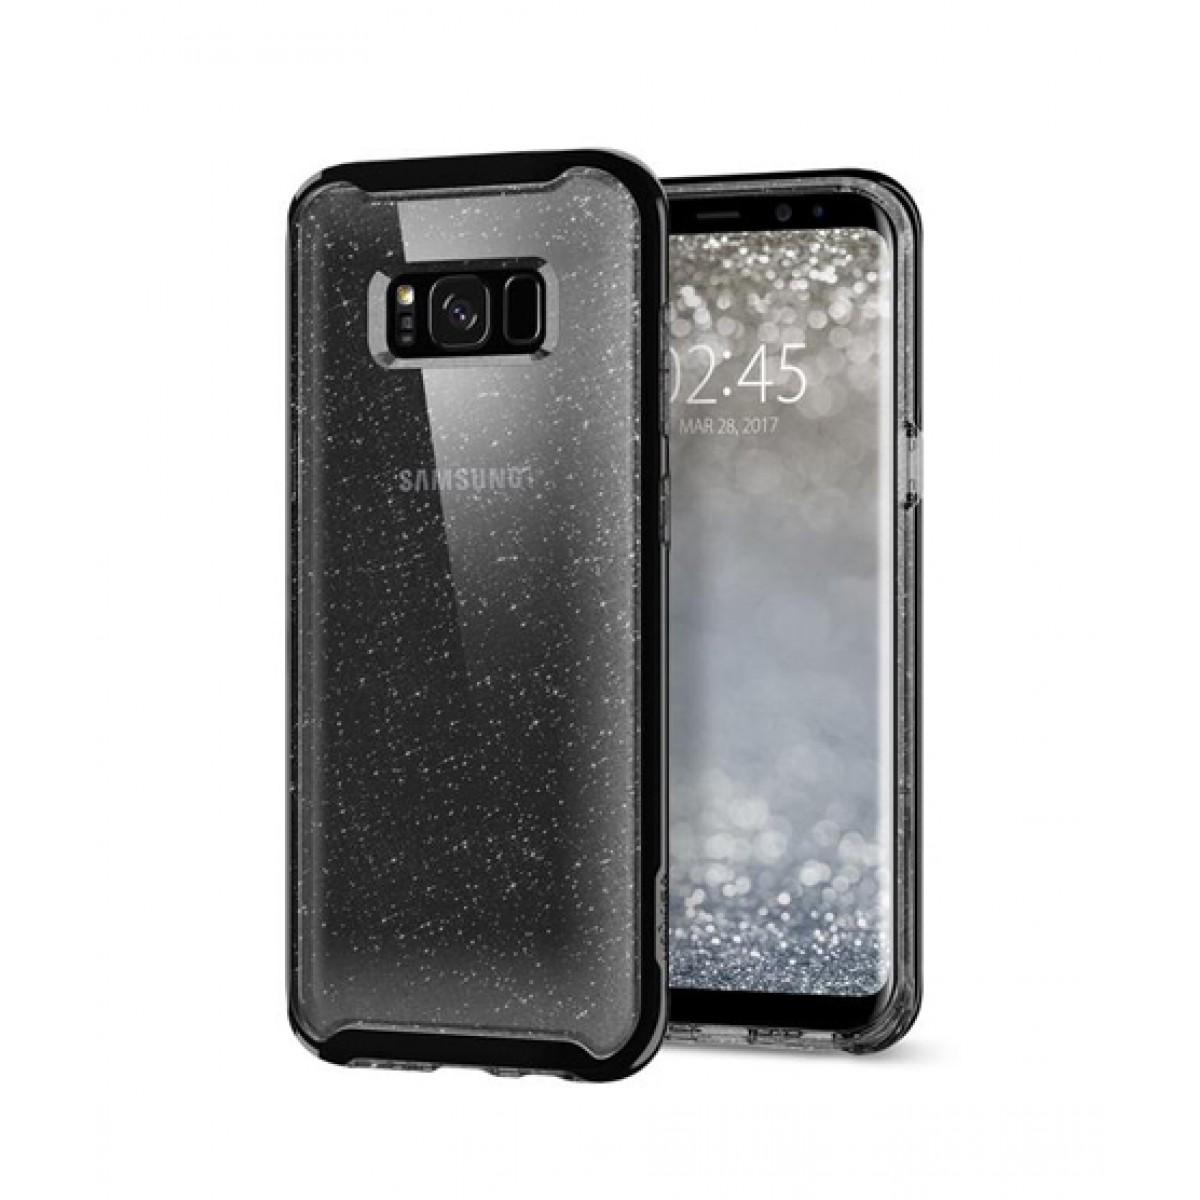 timeless design 59772 8eaac Spigen Neo Hybrid Crystal Glitter Space Quartz Case For Galaxy S8